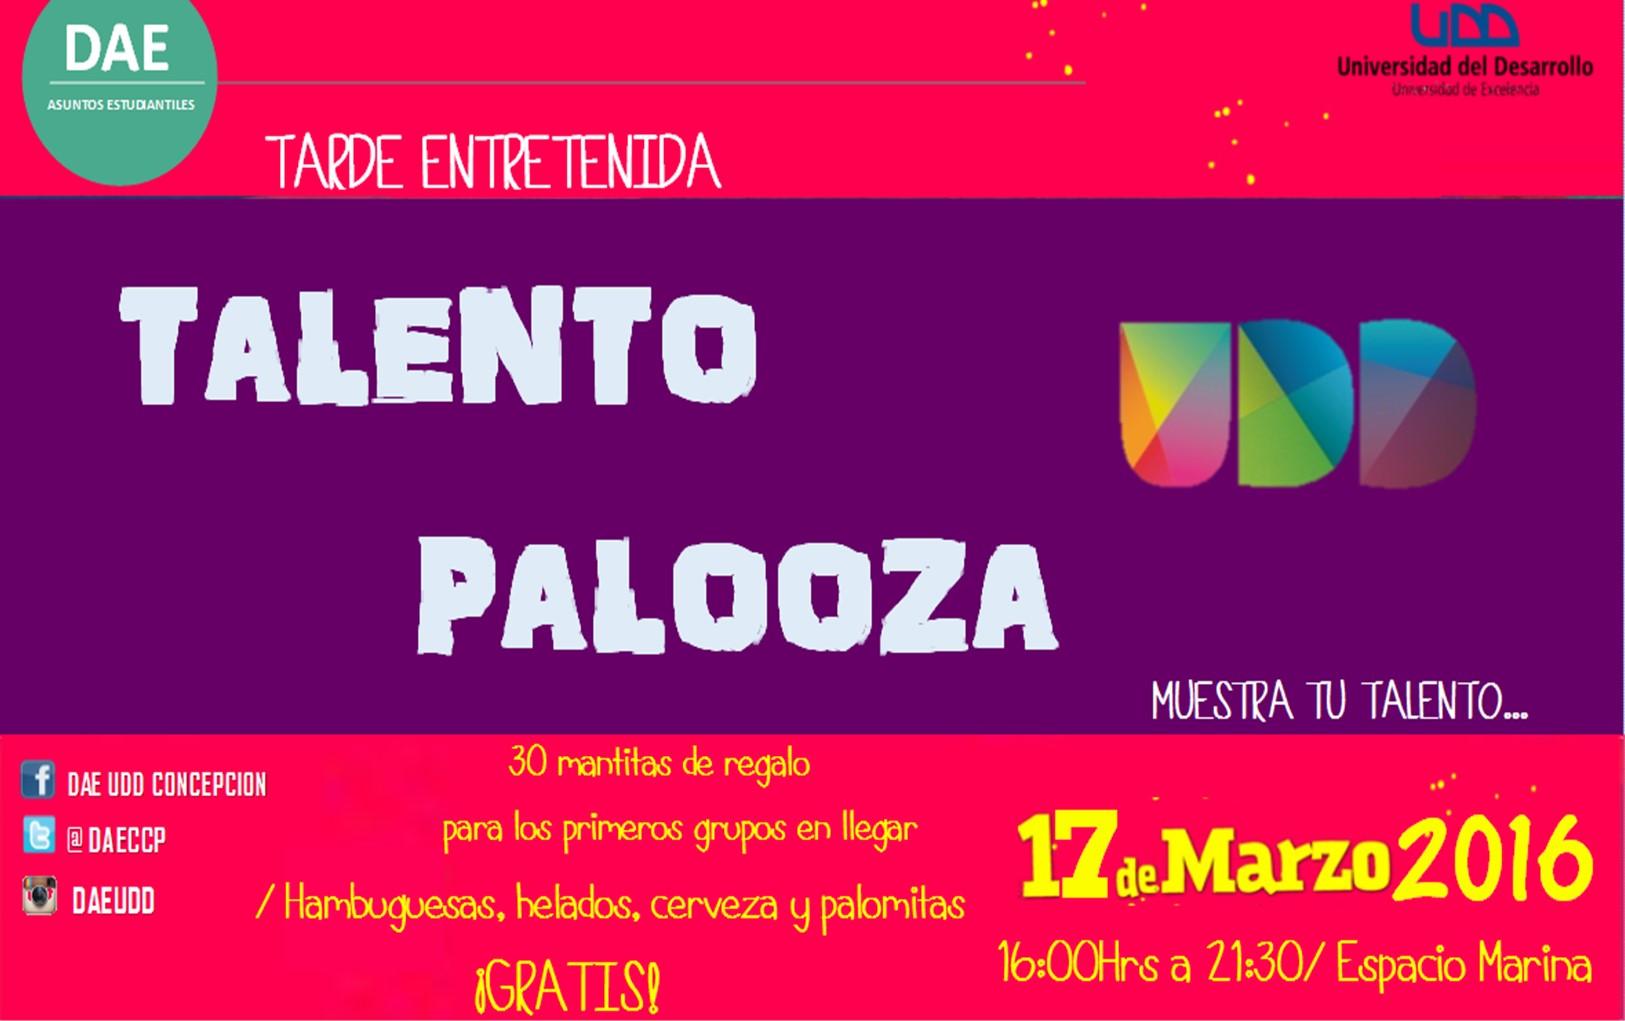 Talento Palooza